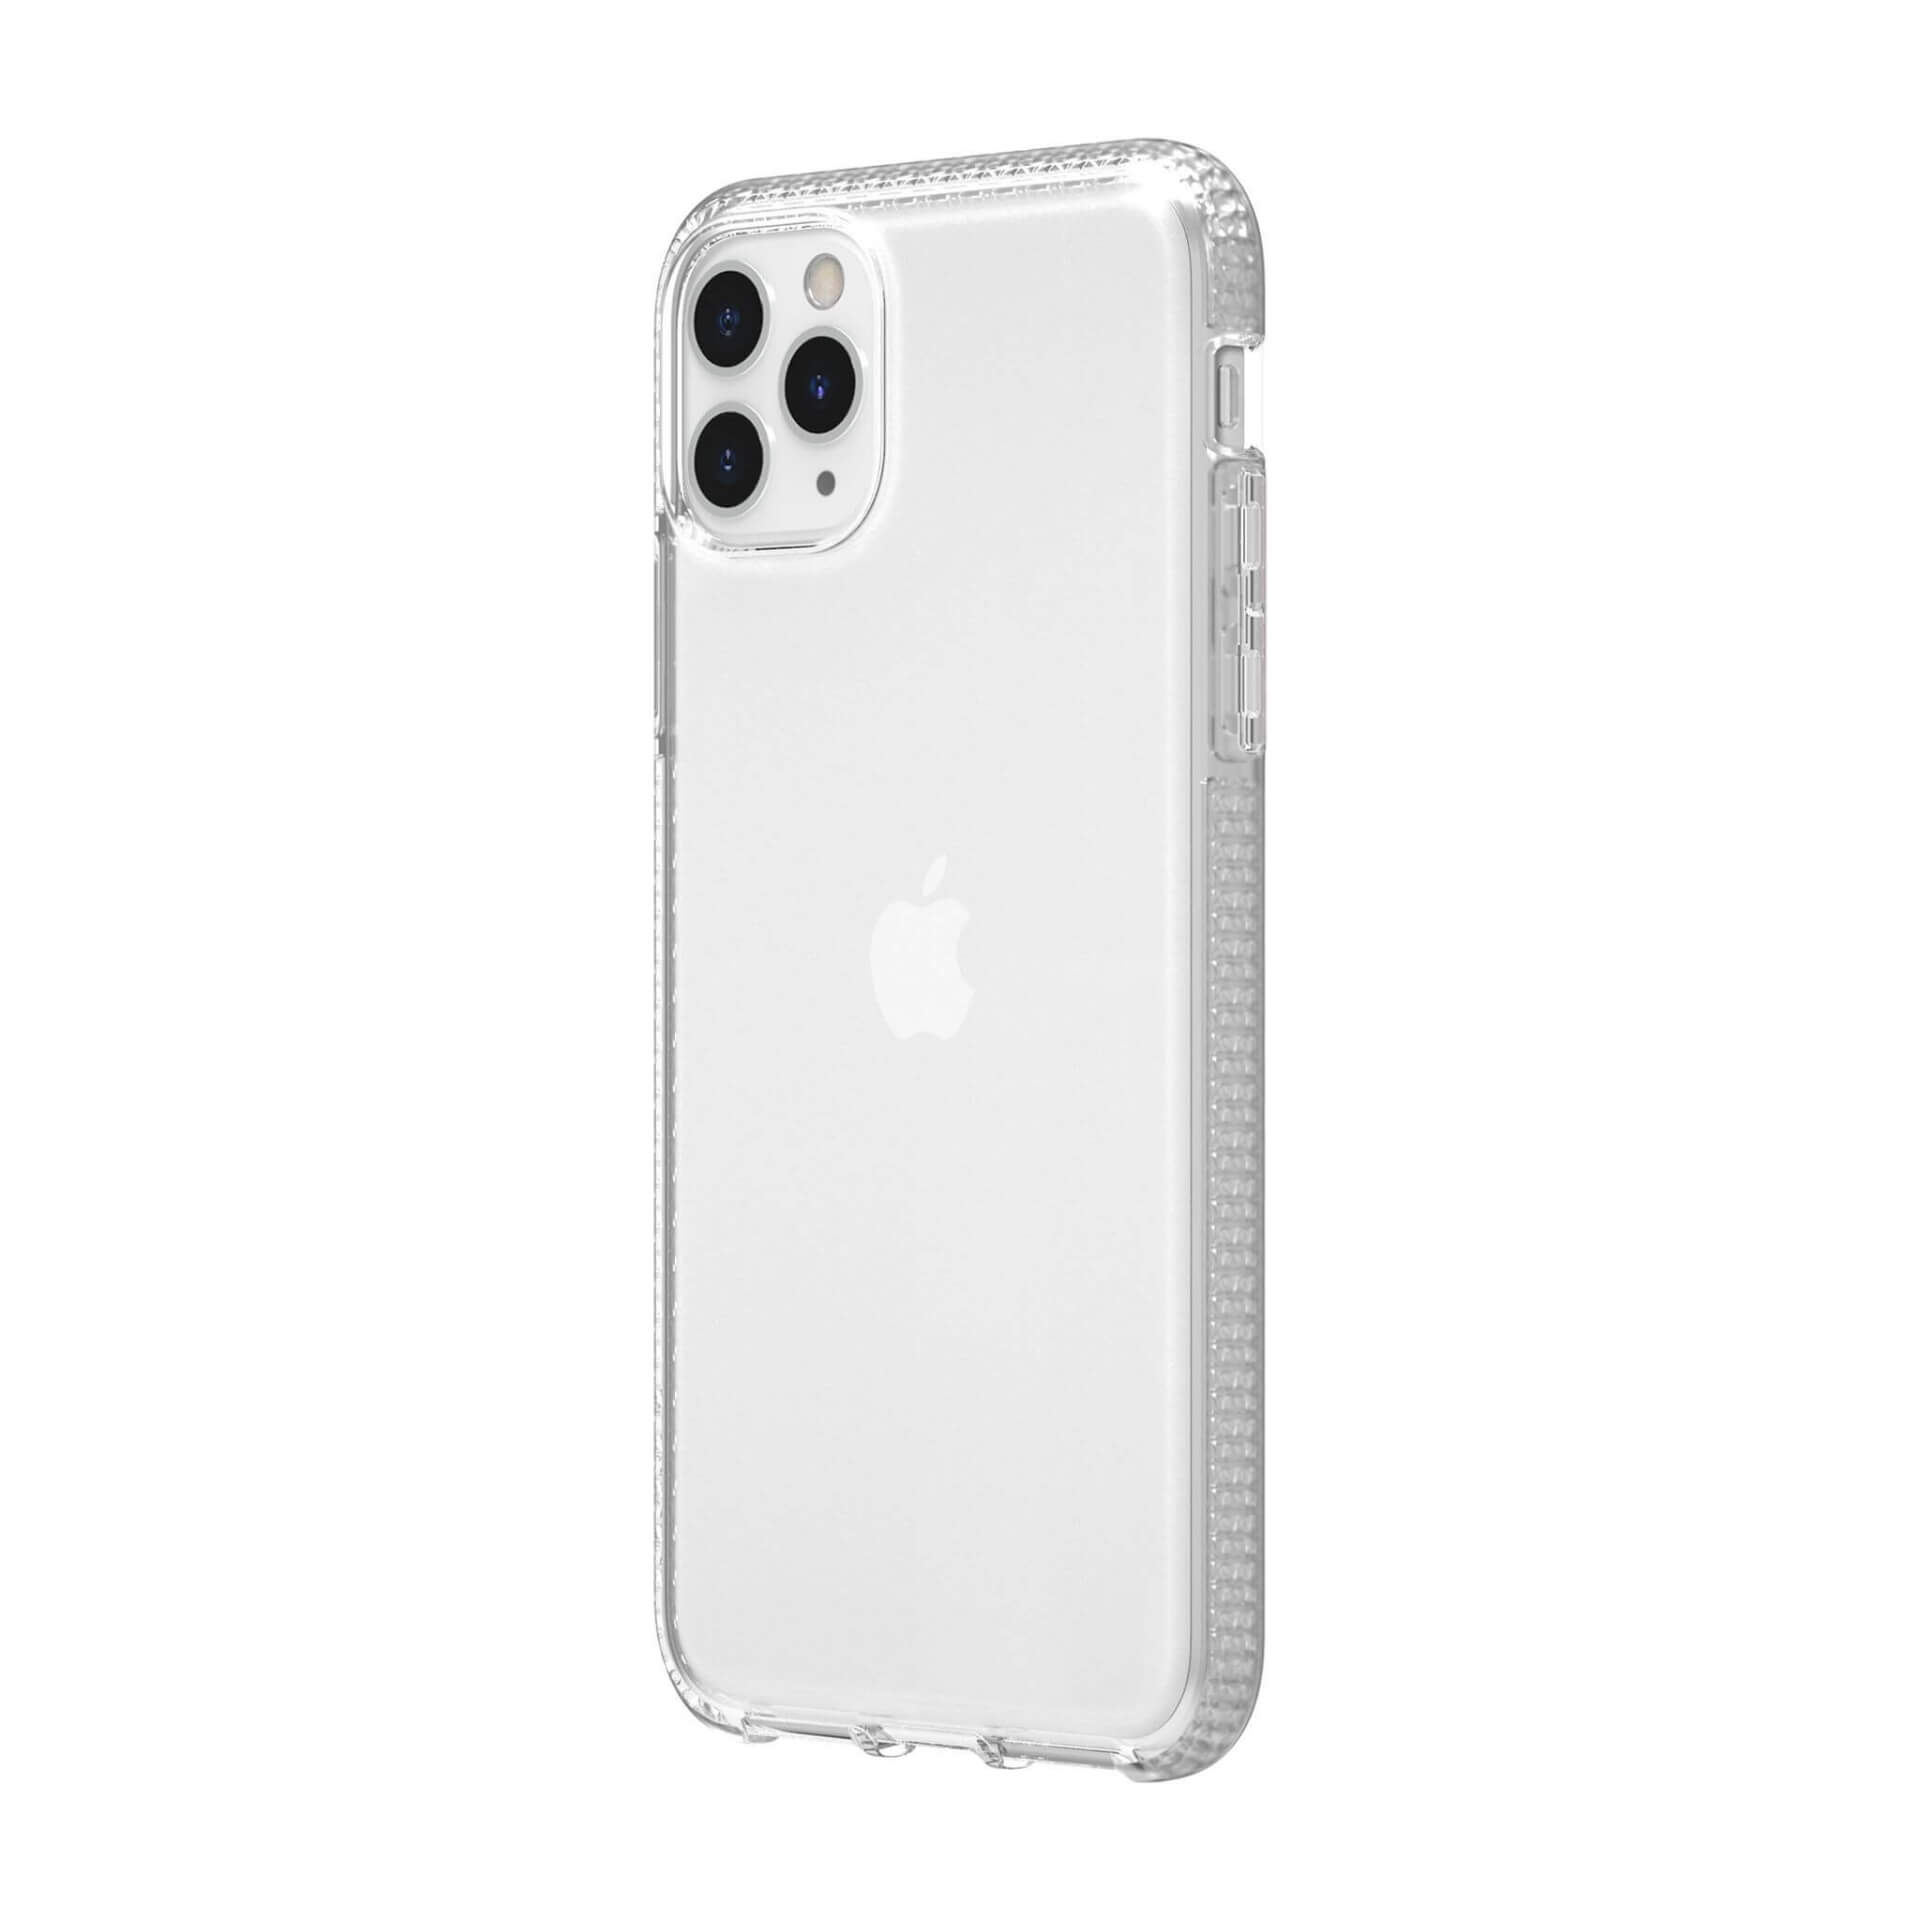 Griffin Survivor Clear Case — хибриден удароустойчив кейс за iPhone 11 Pro (прозрачен) - 3